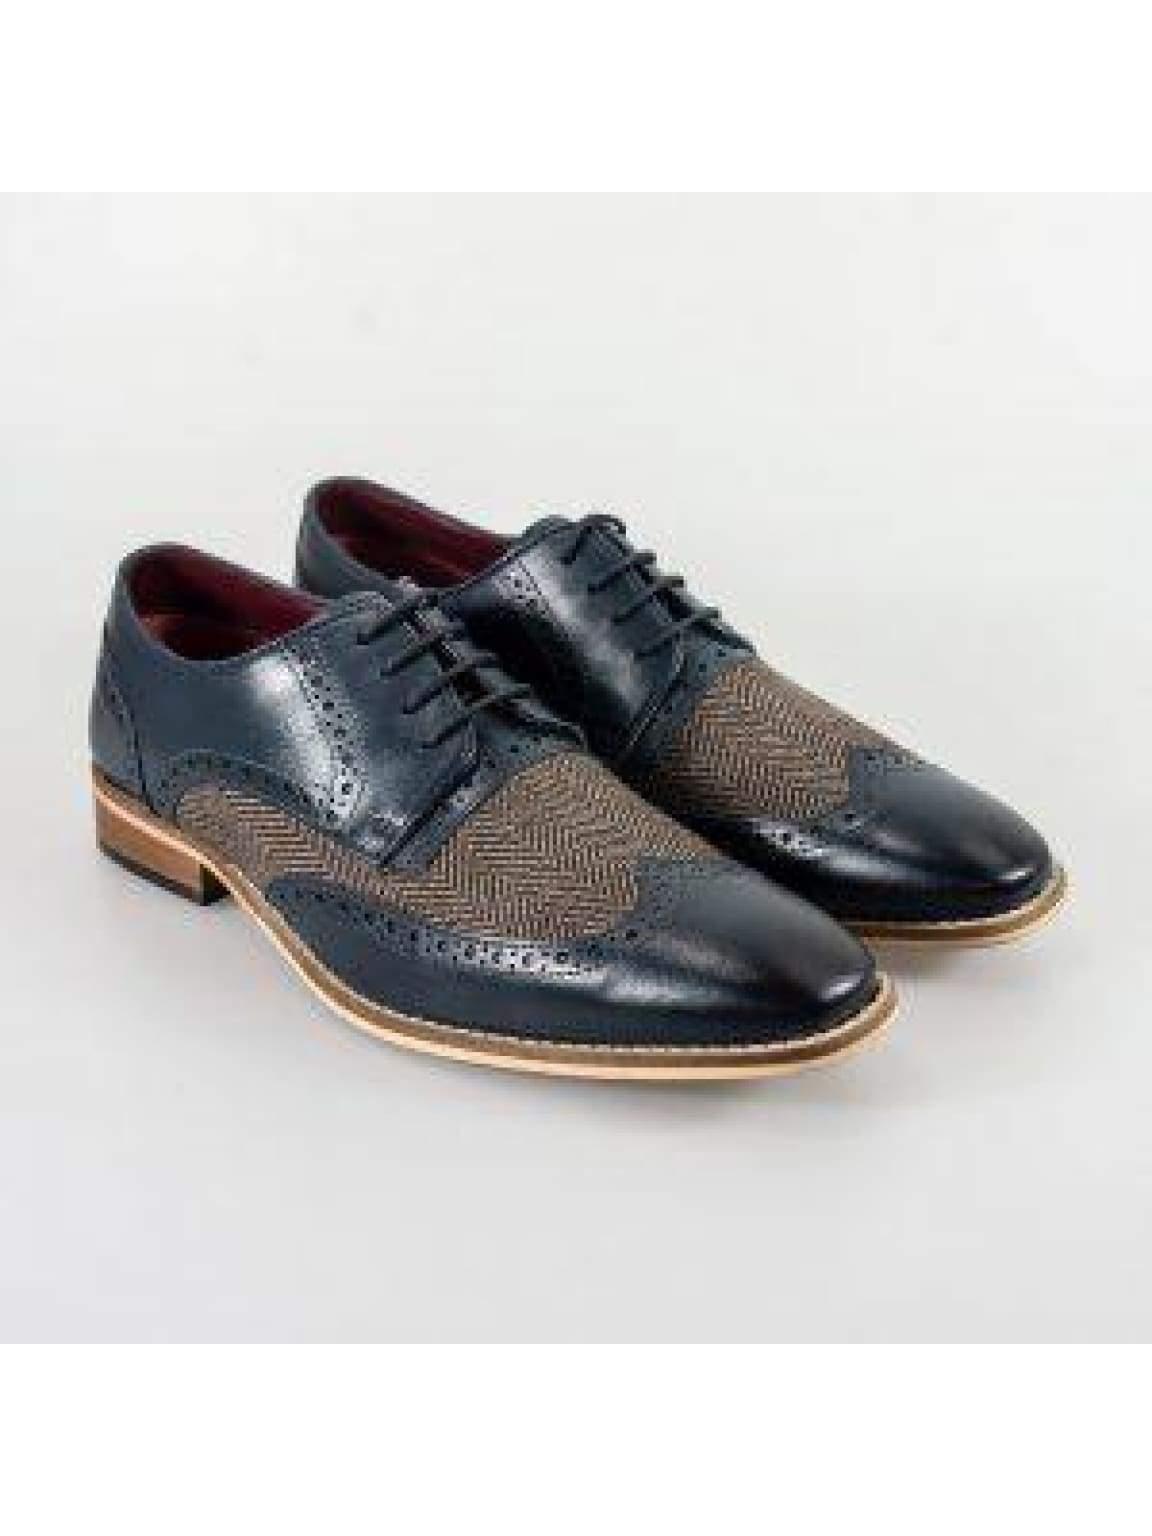 Cavani William Grey/Blue Mens Shoes - UK7 | EU41 - Shoes